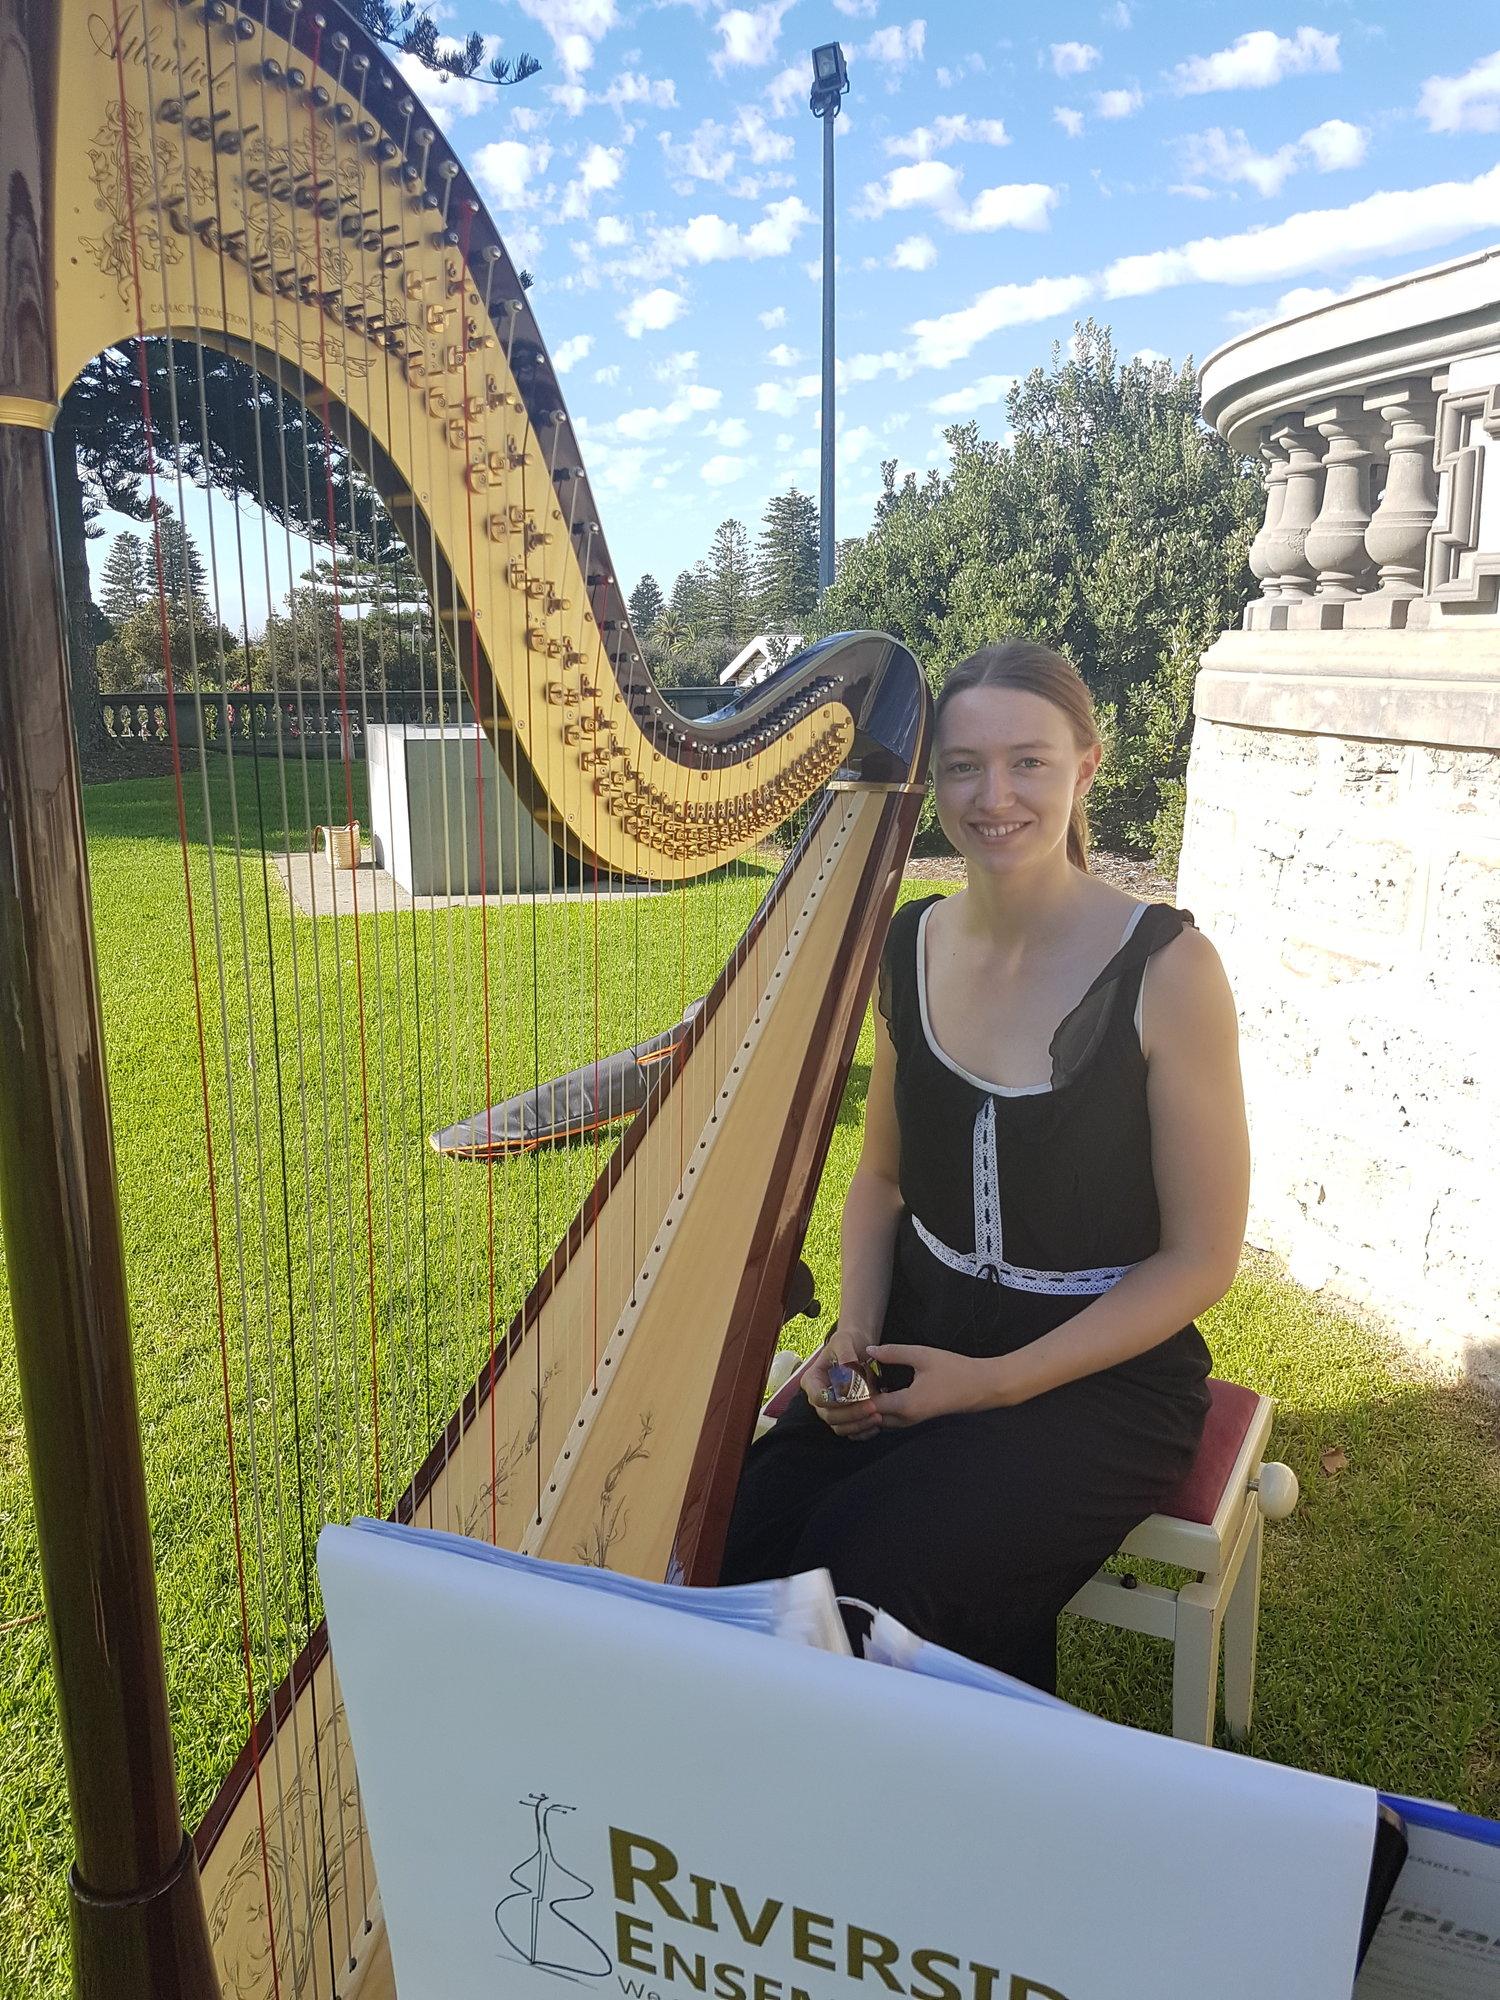 perth-function-string-music-hire-wedding-riverside-harp-harpist